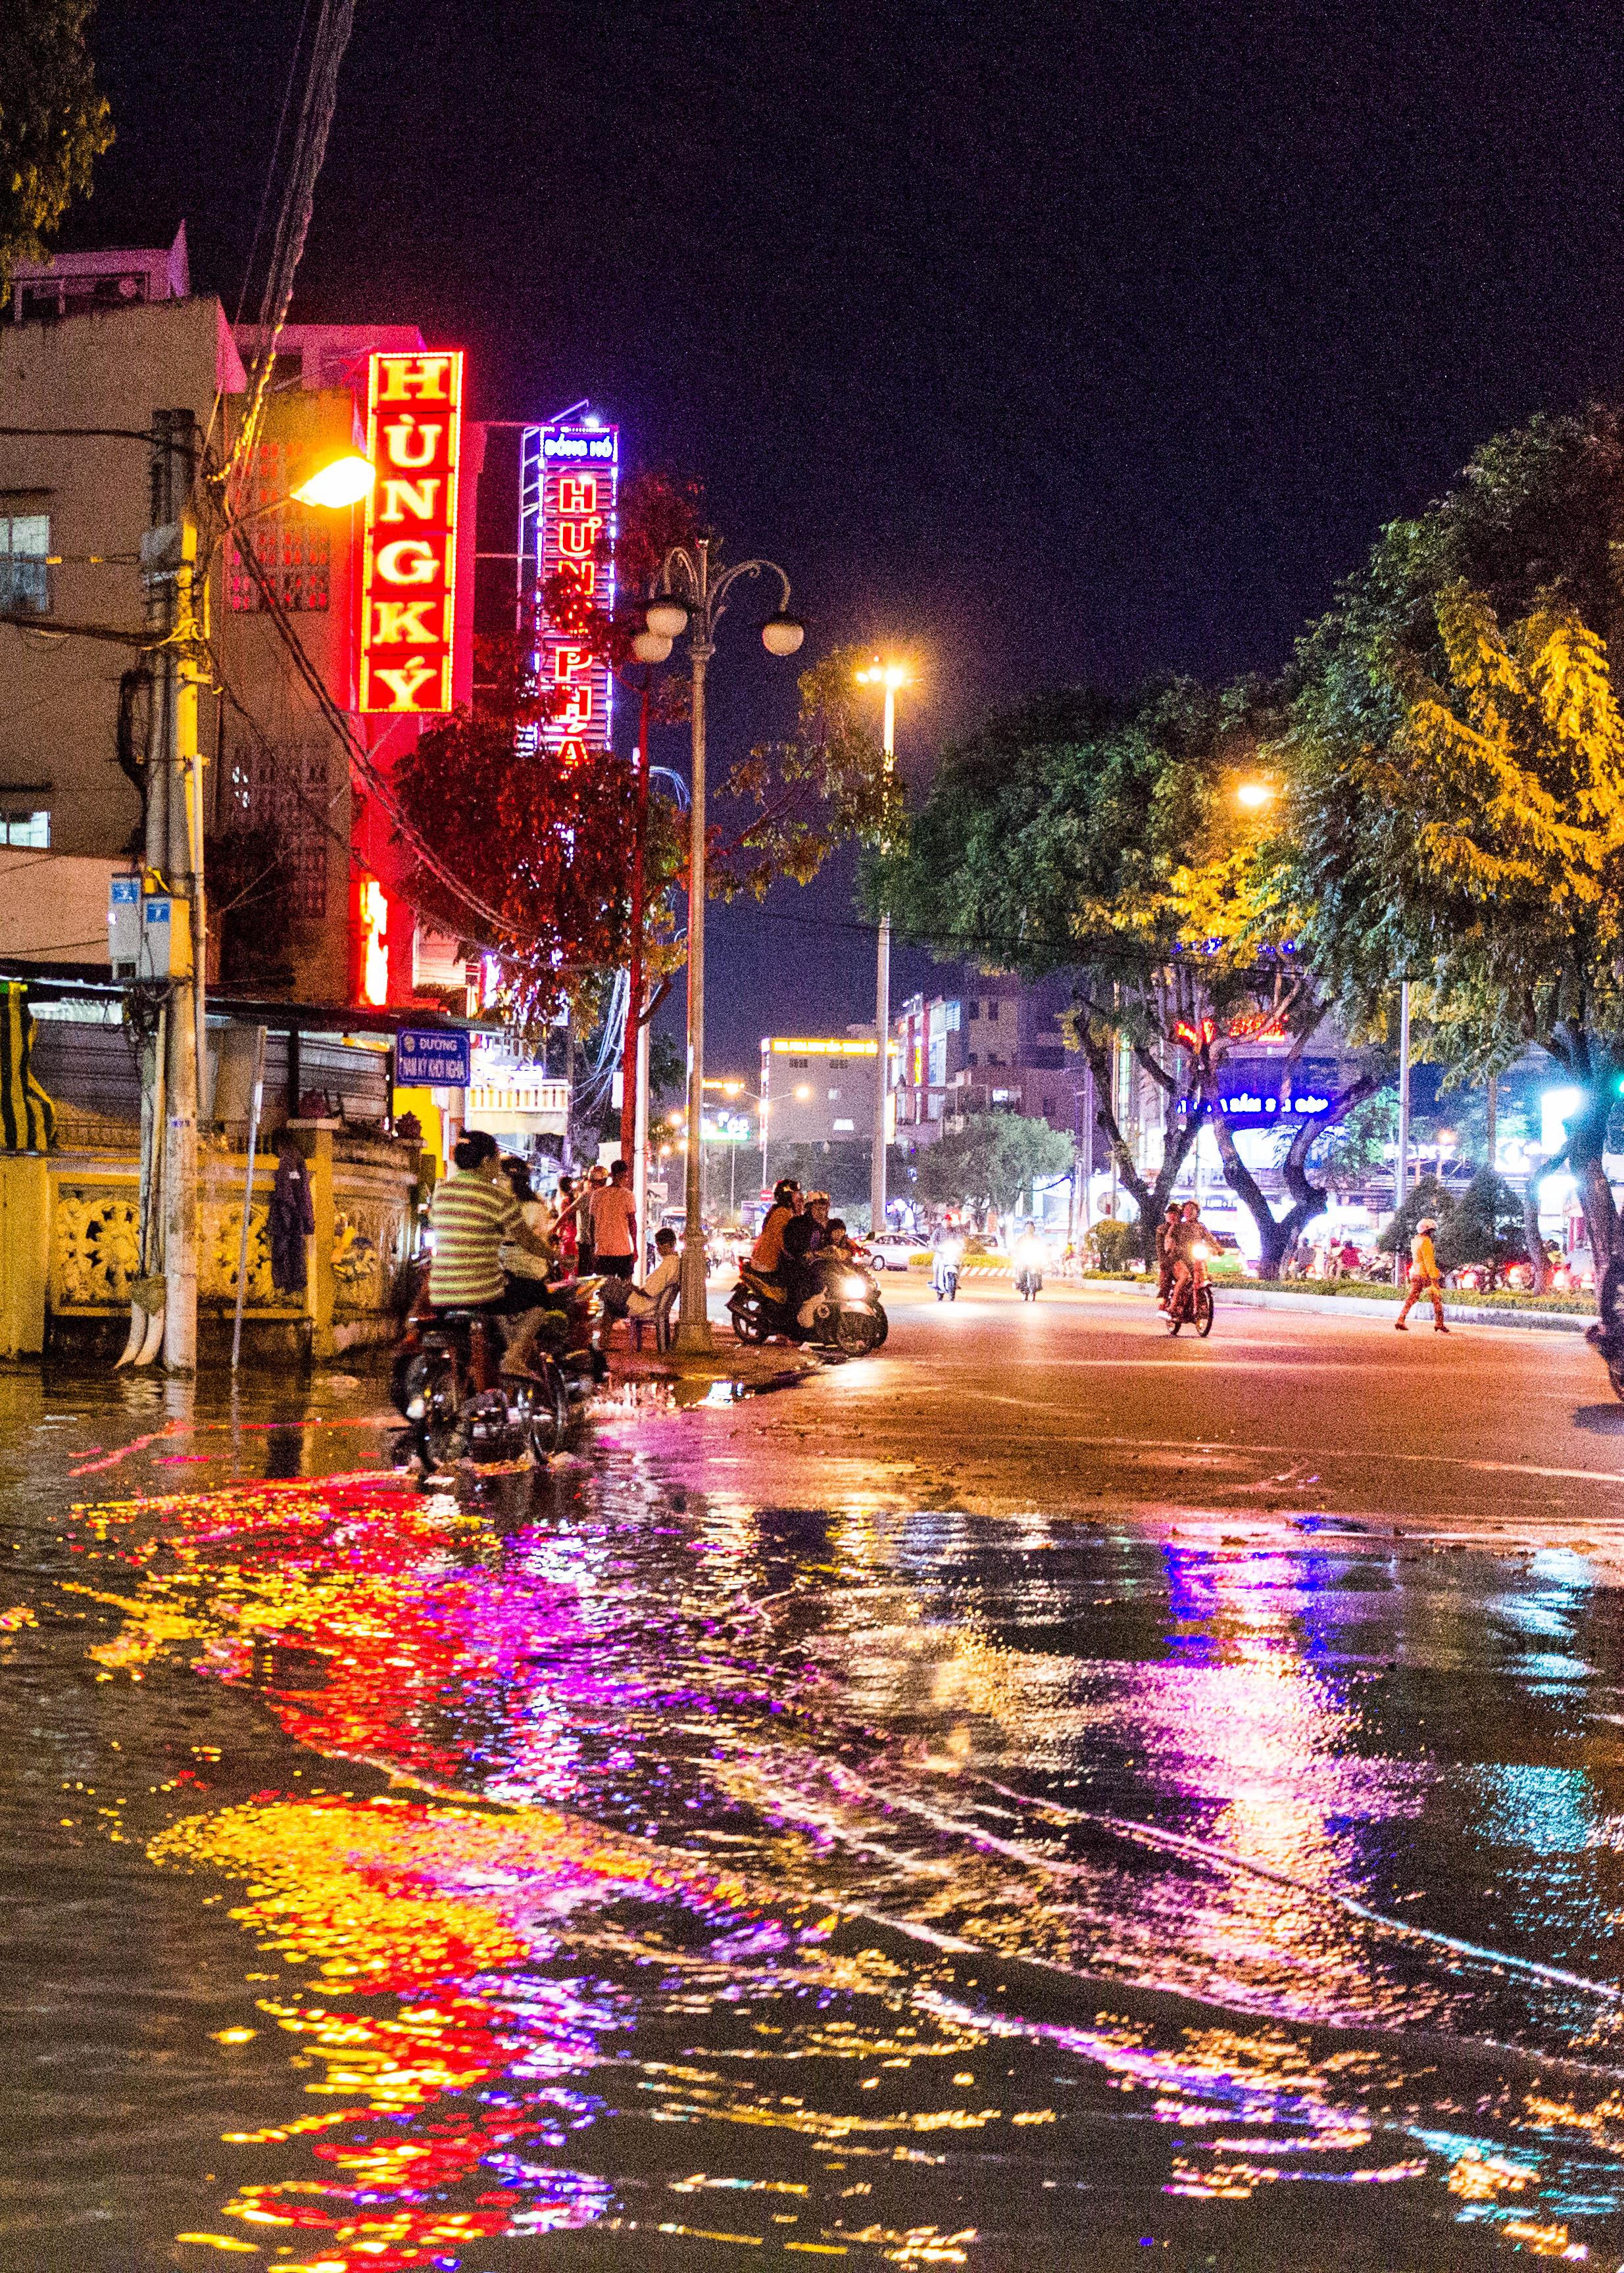 Flooded streets in Cần Thơ, Vietnam